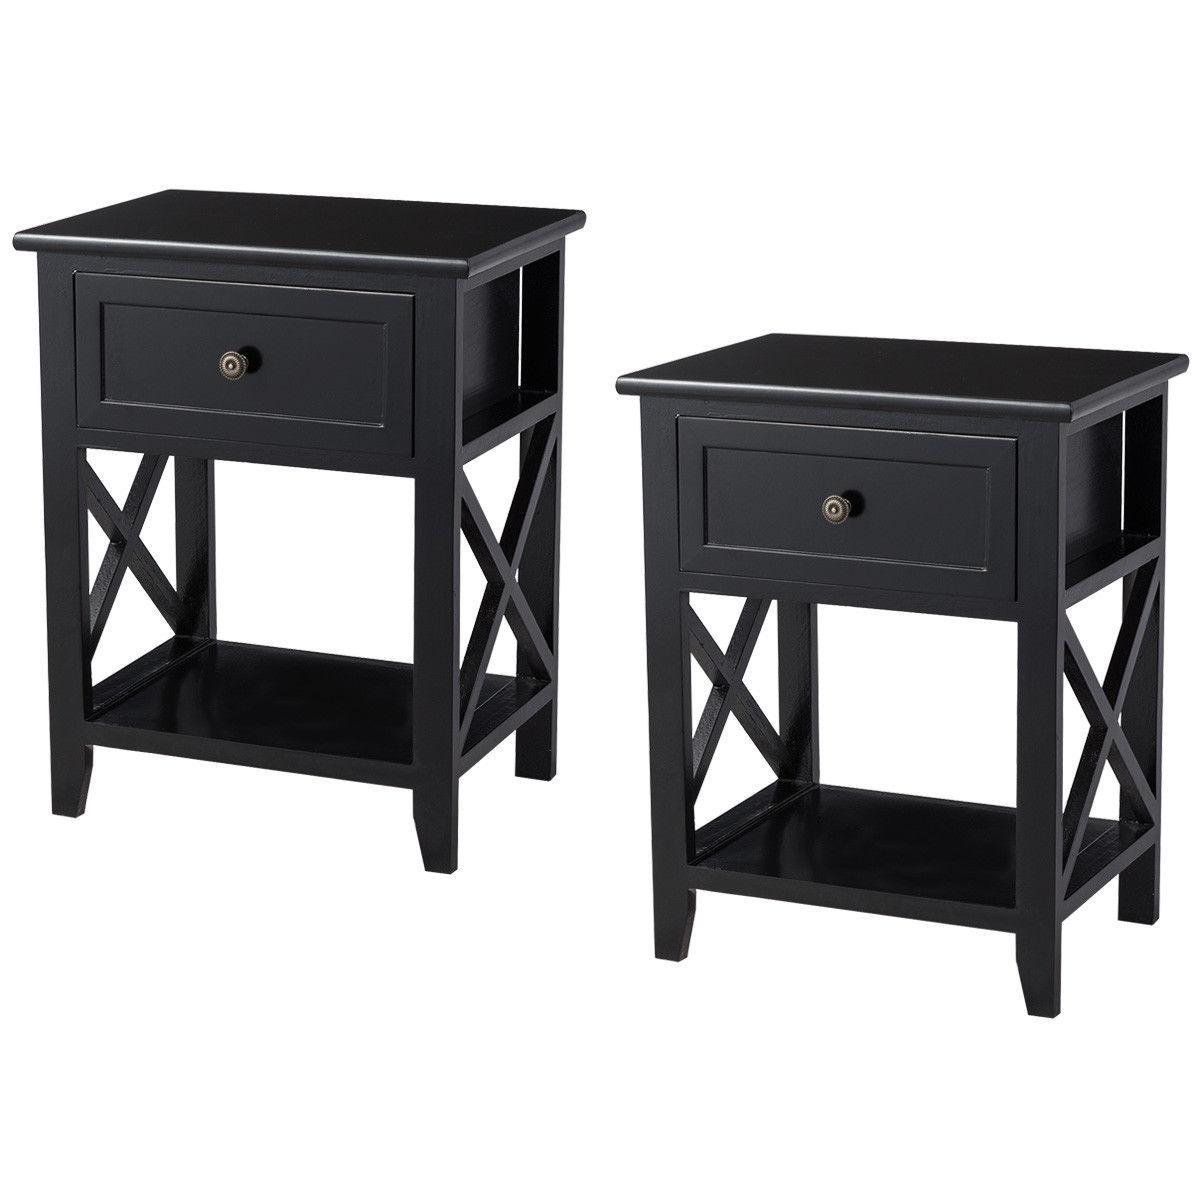 Costway 2PCS End Bedside Table Nightstand Drawer Storage Room Decor W/Bottom Shelf Black